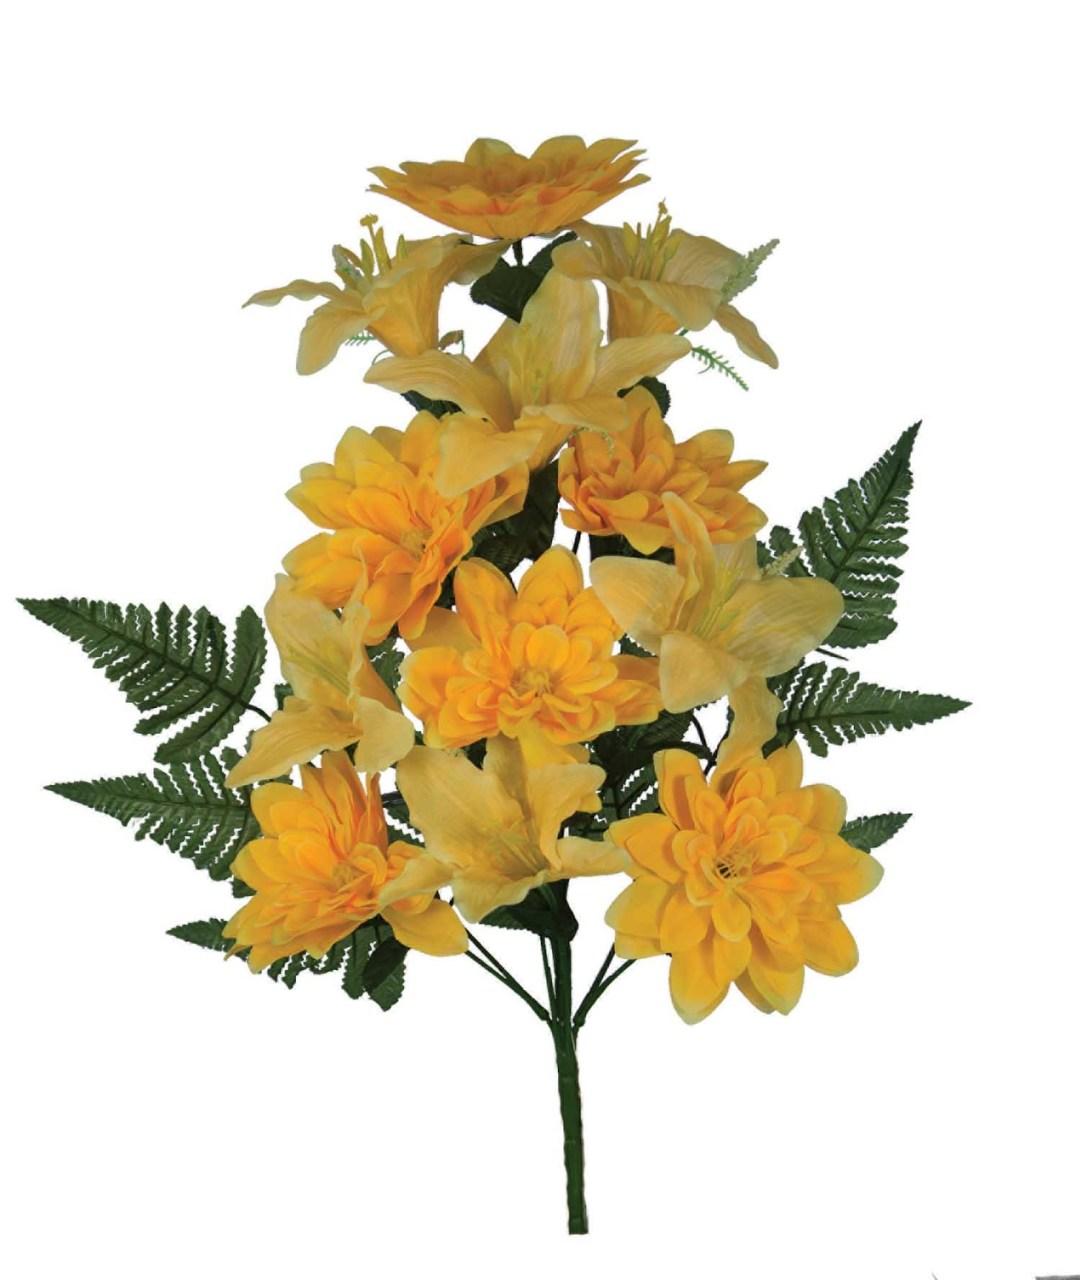 "SB3006YELL - 18"" One Sided Open Lily / Dahlia Mix x12 $3.95 each SB3006YELL"